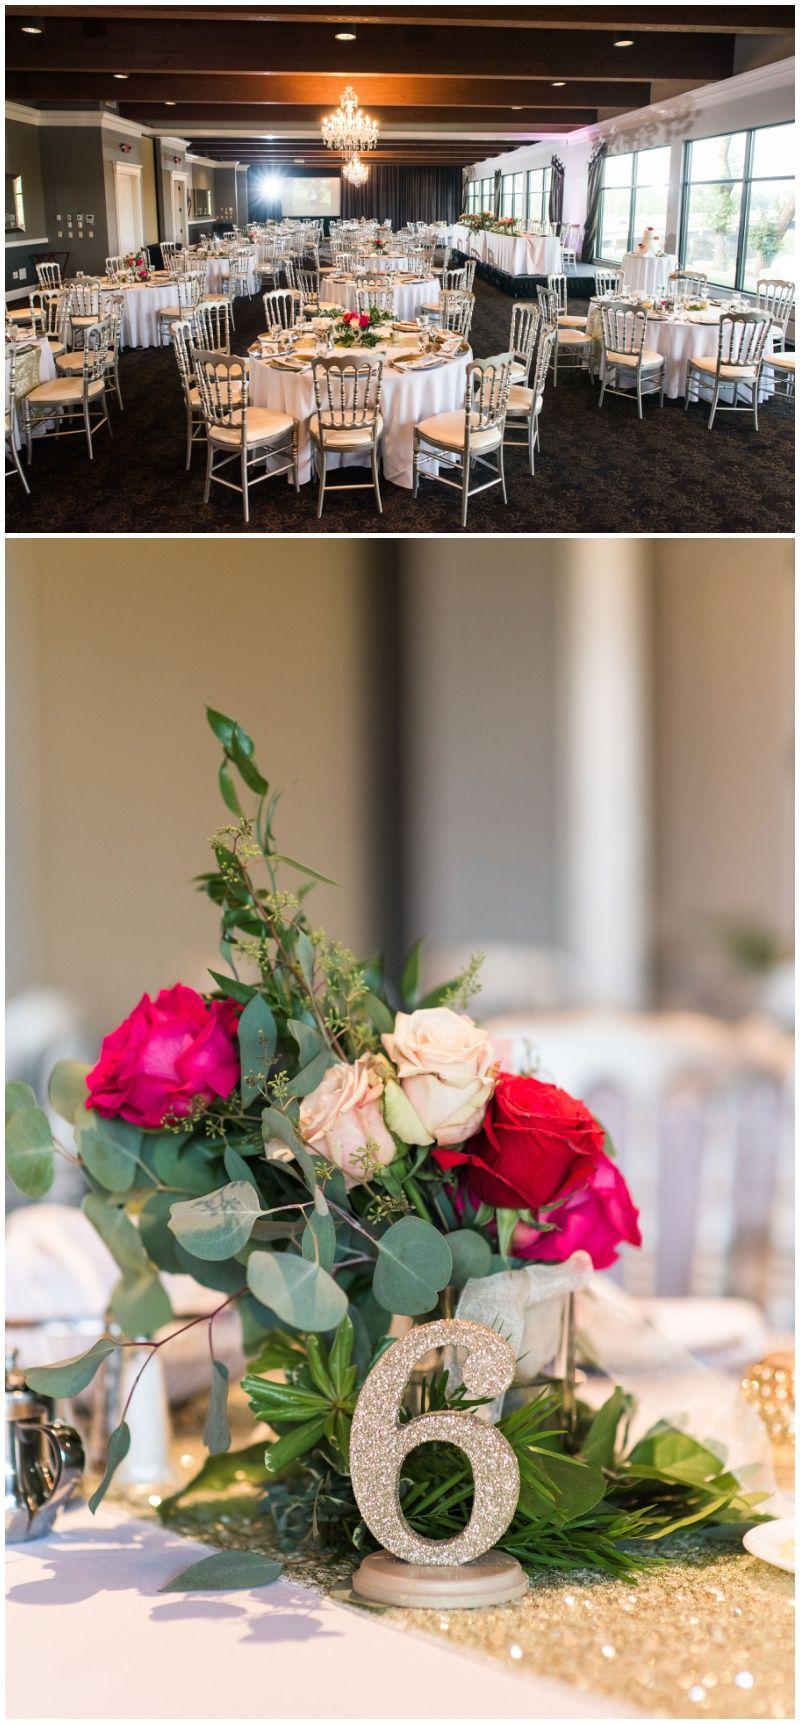 Leopold's Mississippi Gardens Floral wedding, Bridesmaid